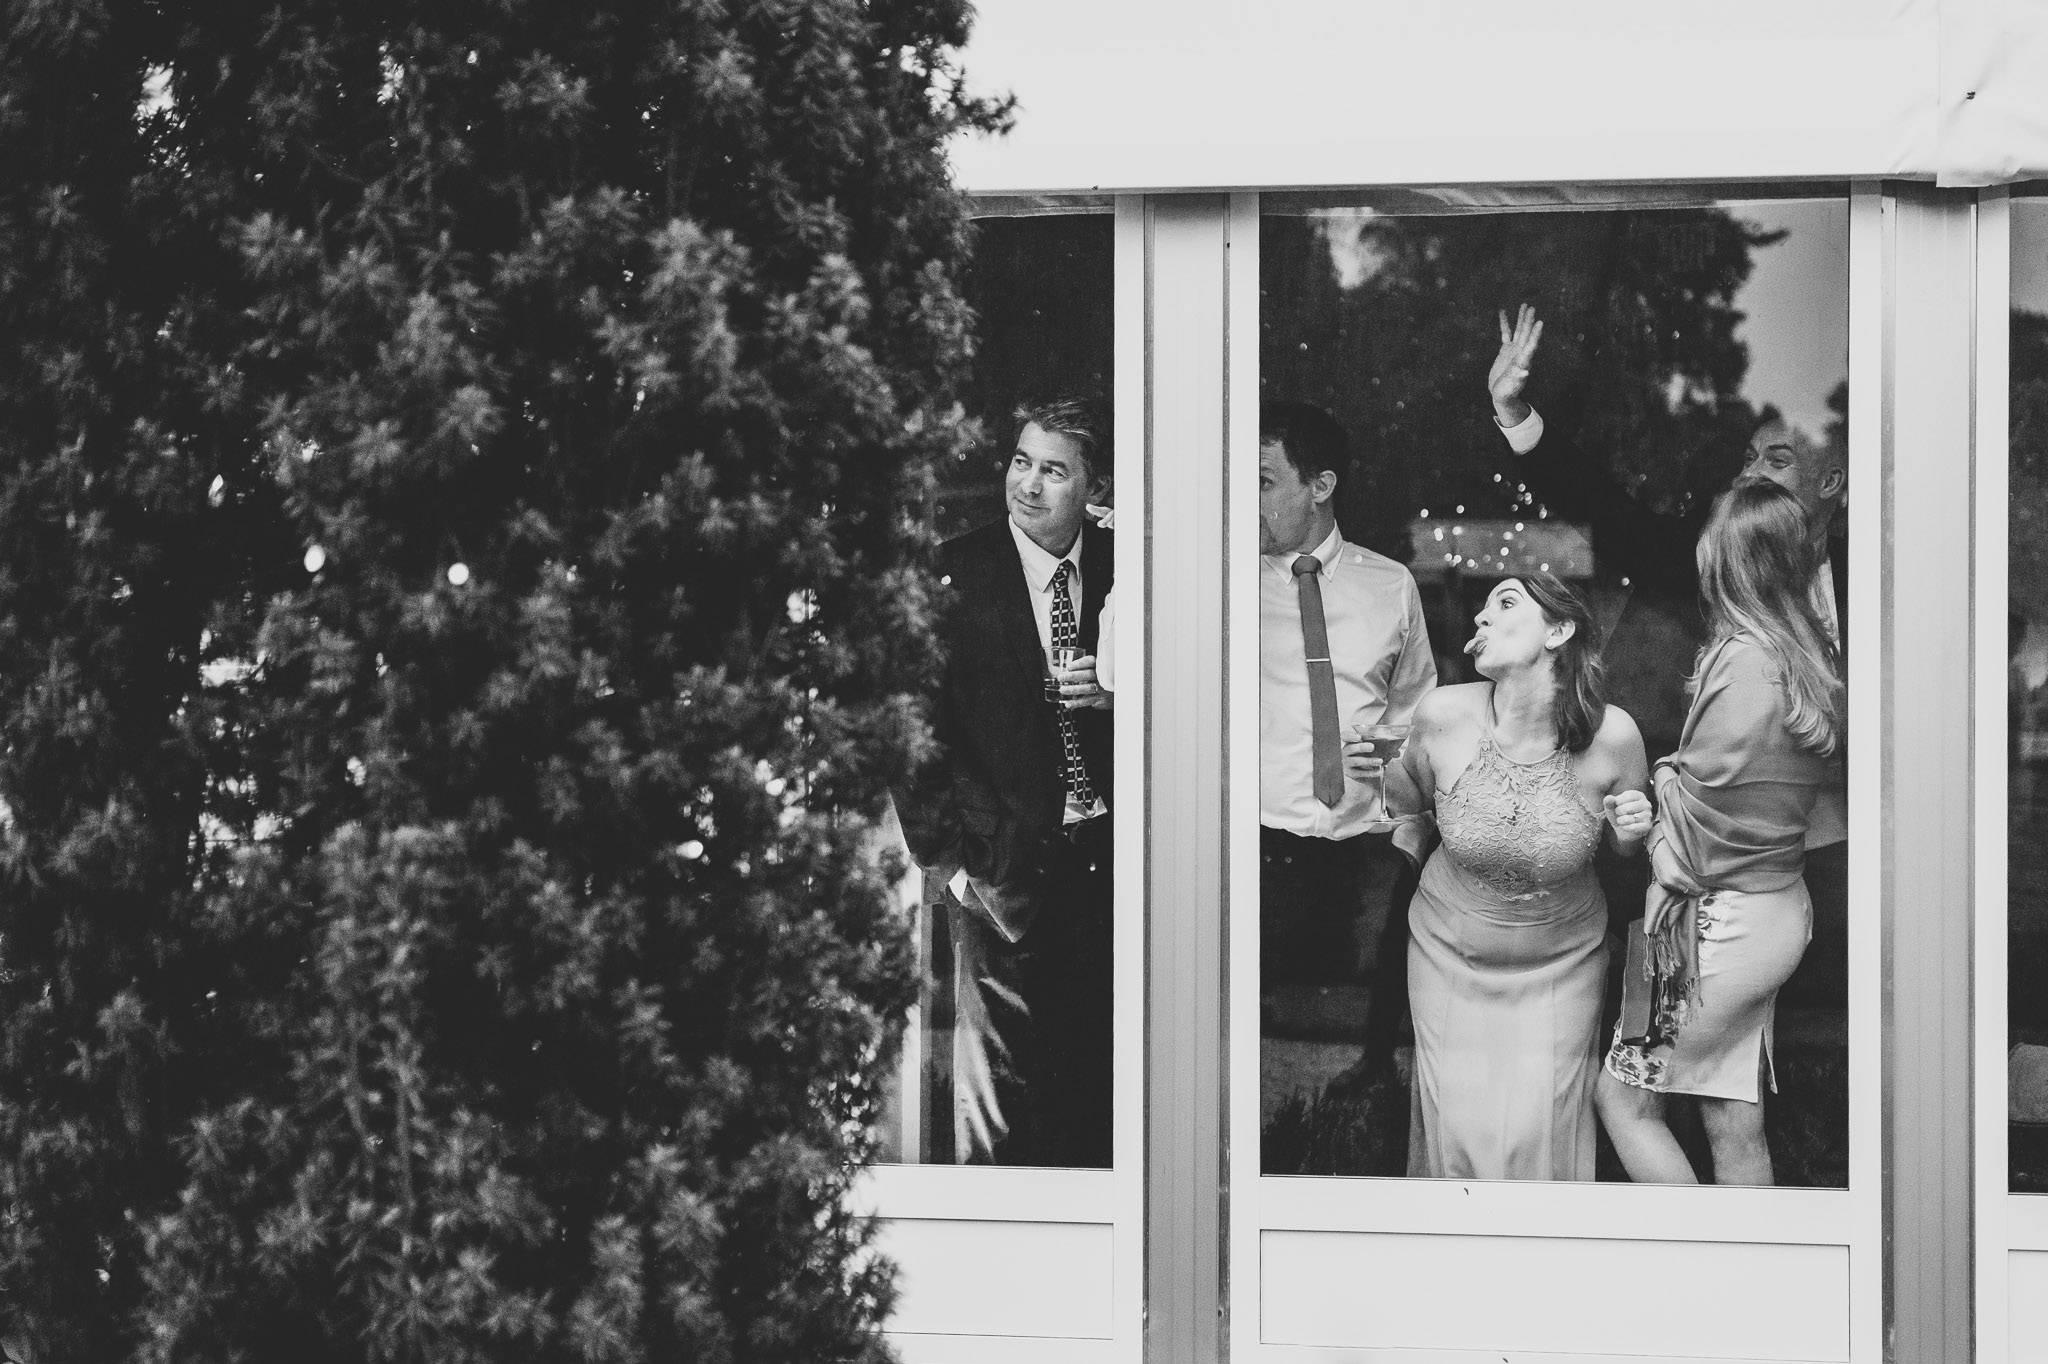 shropshire-wedding-photography 33.jpg